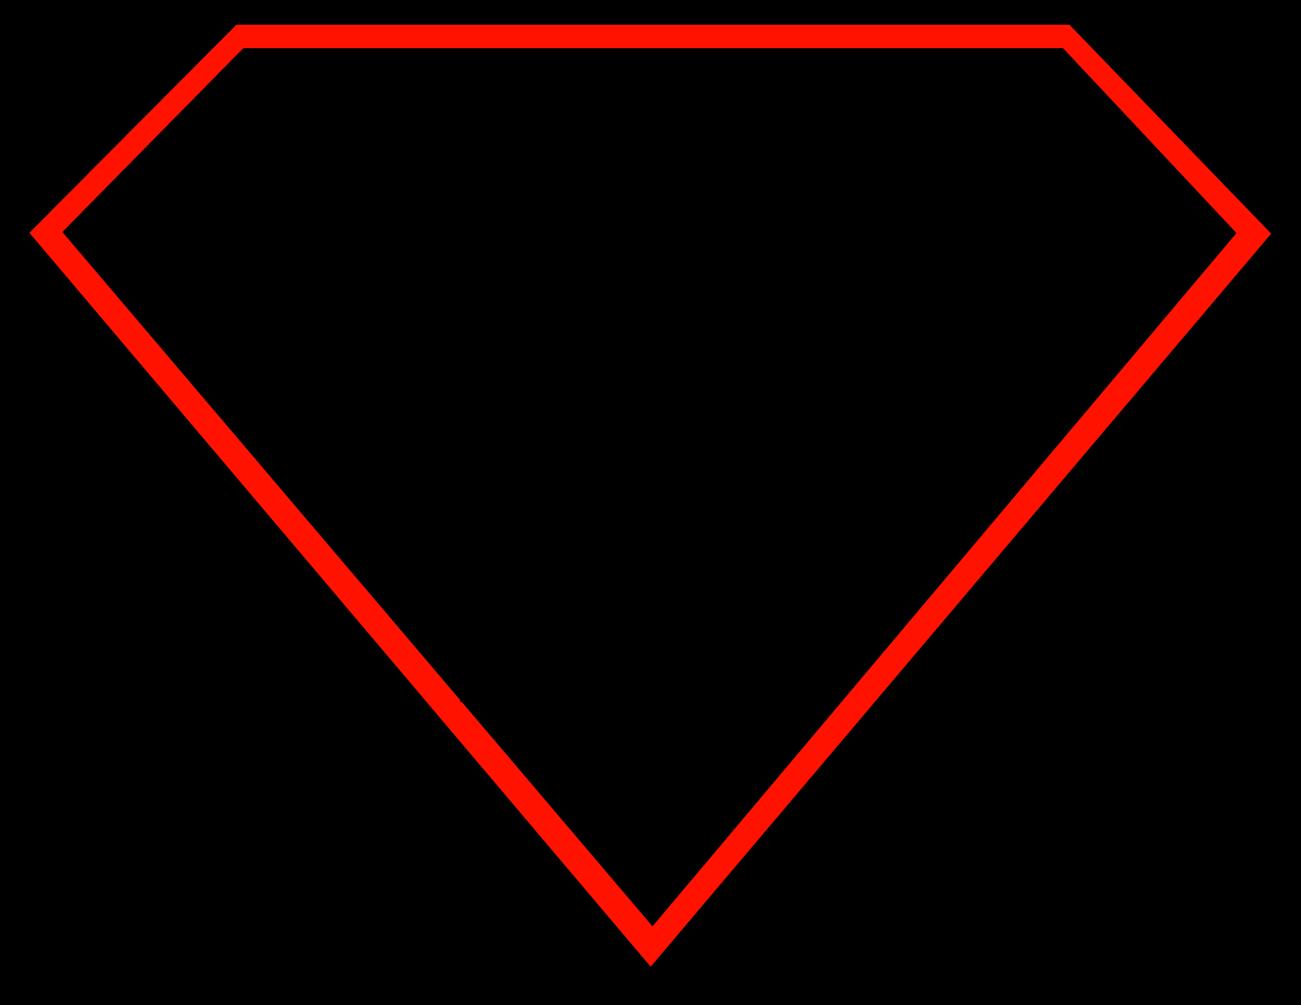 Superman Logo Clip Art Free Clipart Images Cool Easy Superman Drawings Transparent Cartoon Jing Fm